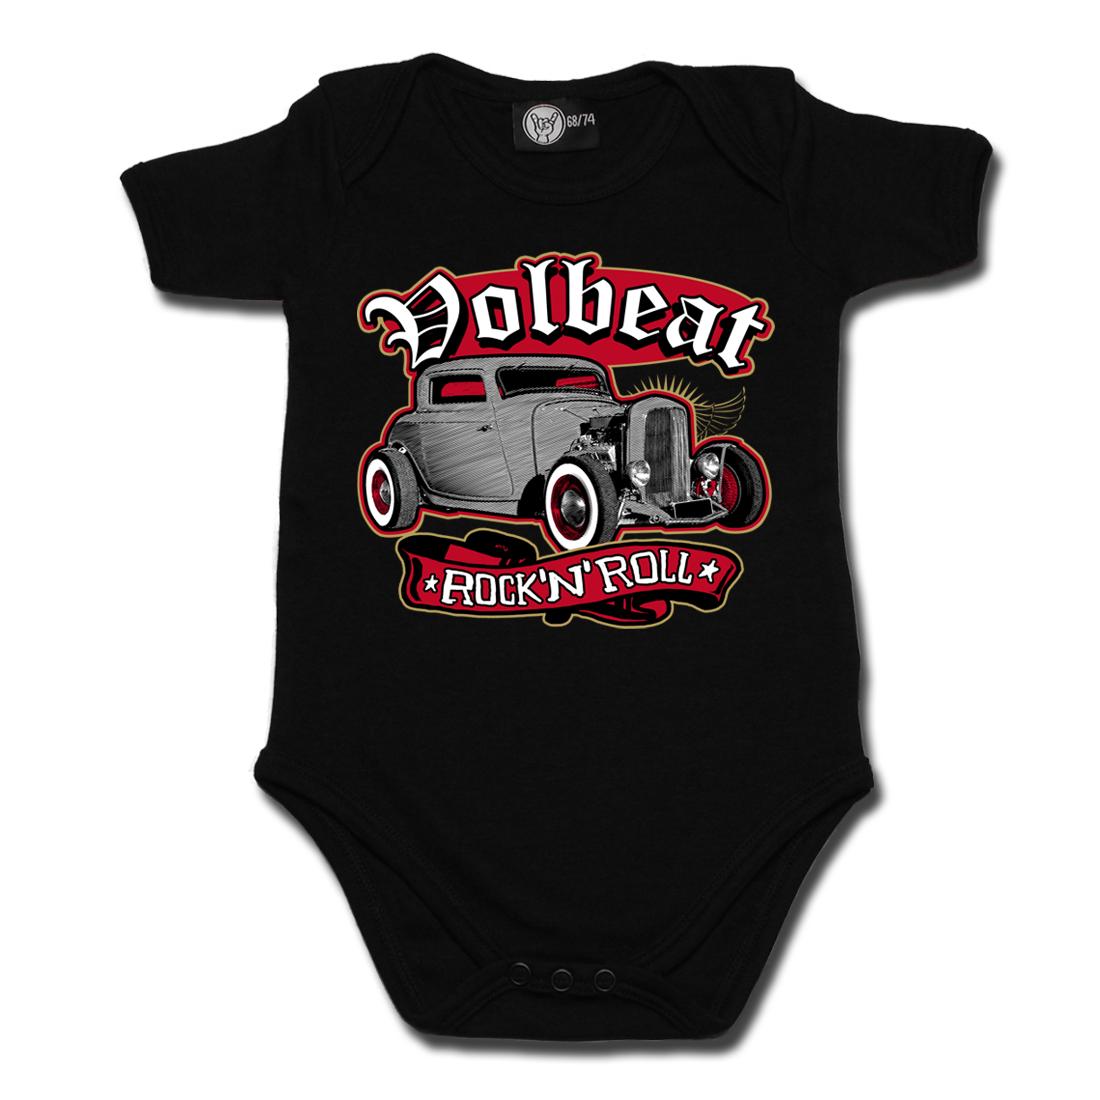 Rock 'n Roll Volbeat Baby Grow